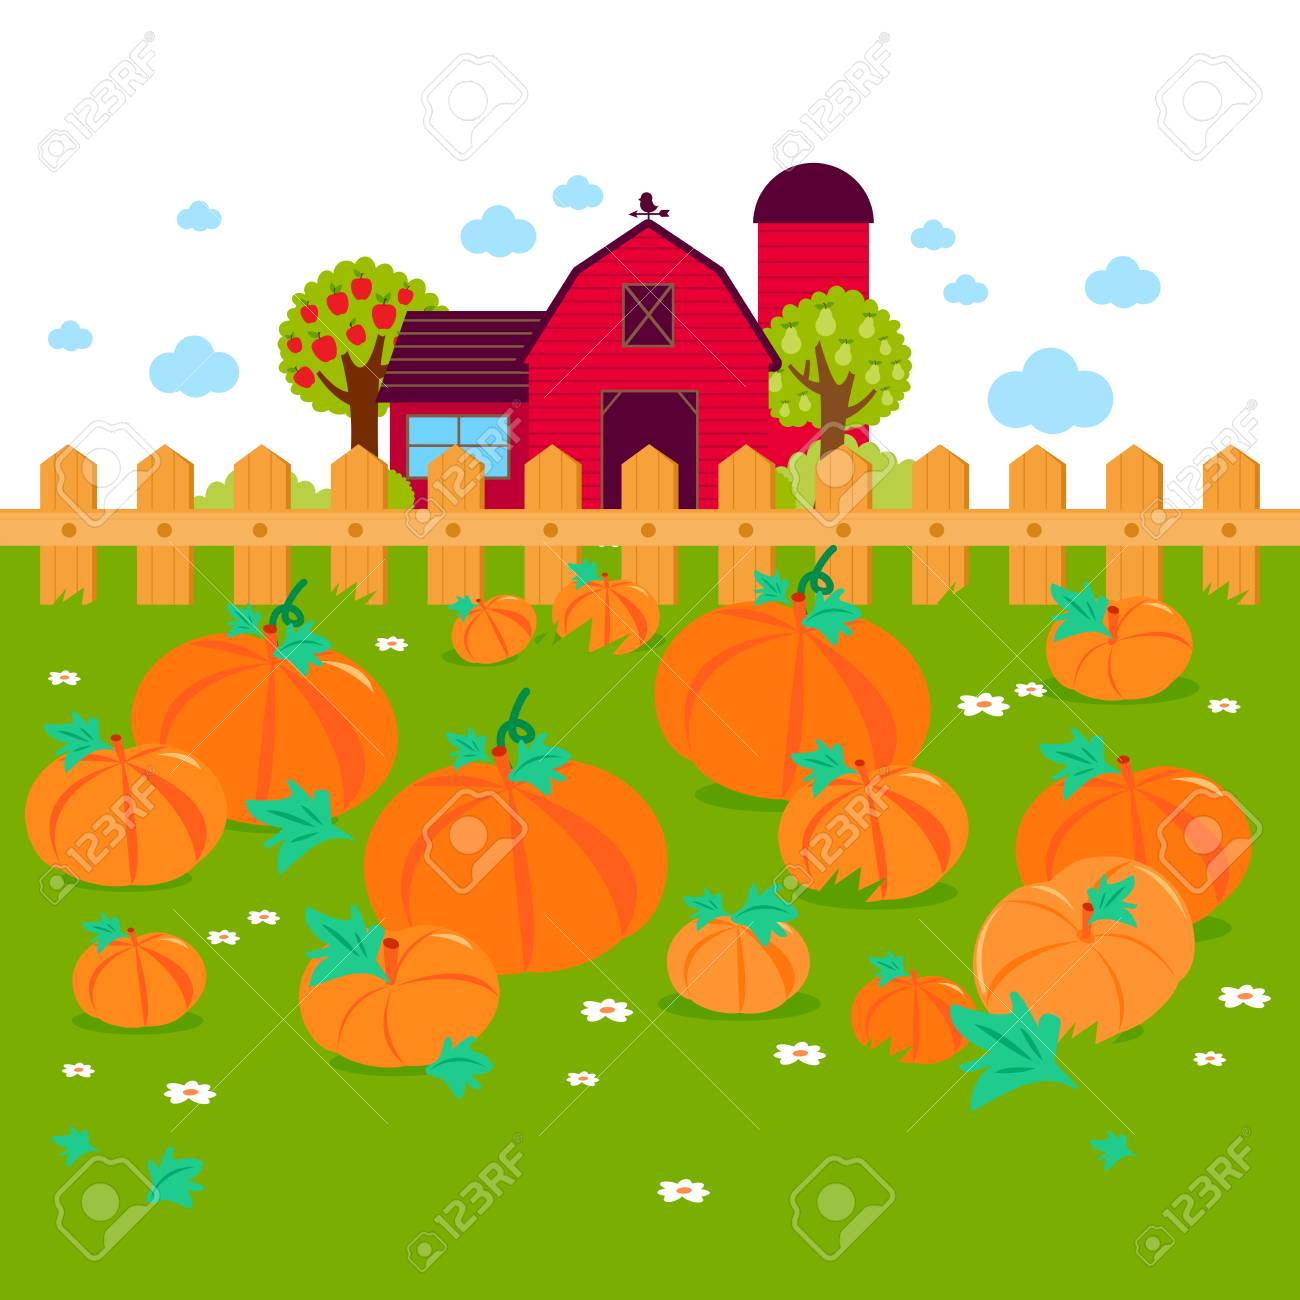 Rural landscape with a pumpkin field and a farmhouse. - 109319975